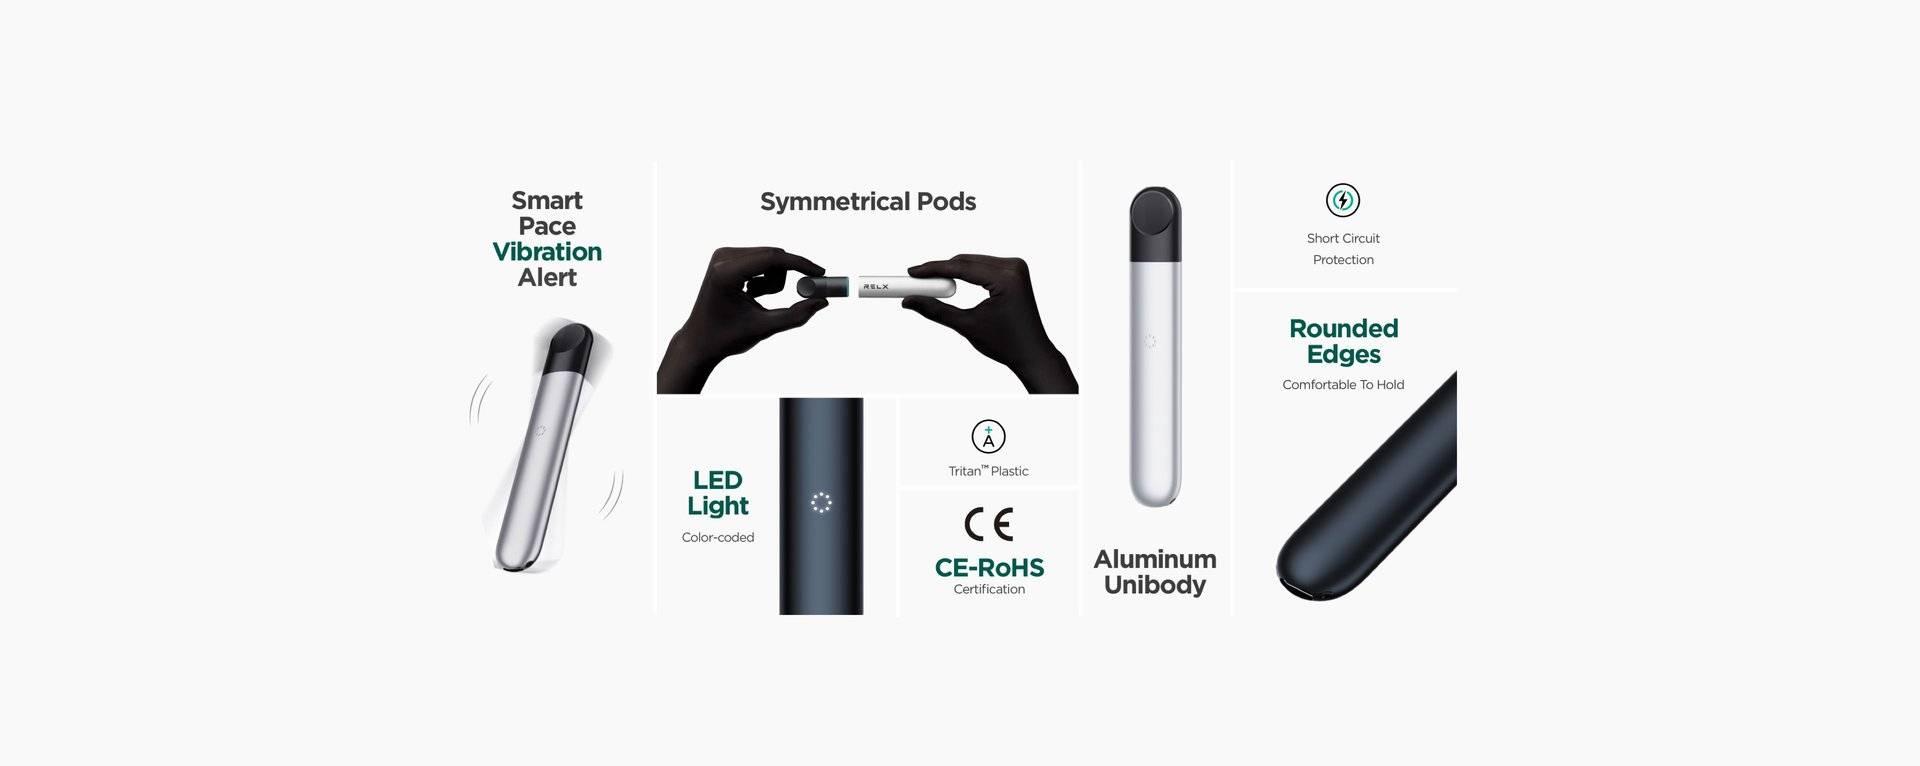 RELX Device use symmetrical pods.